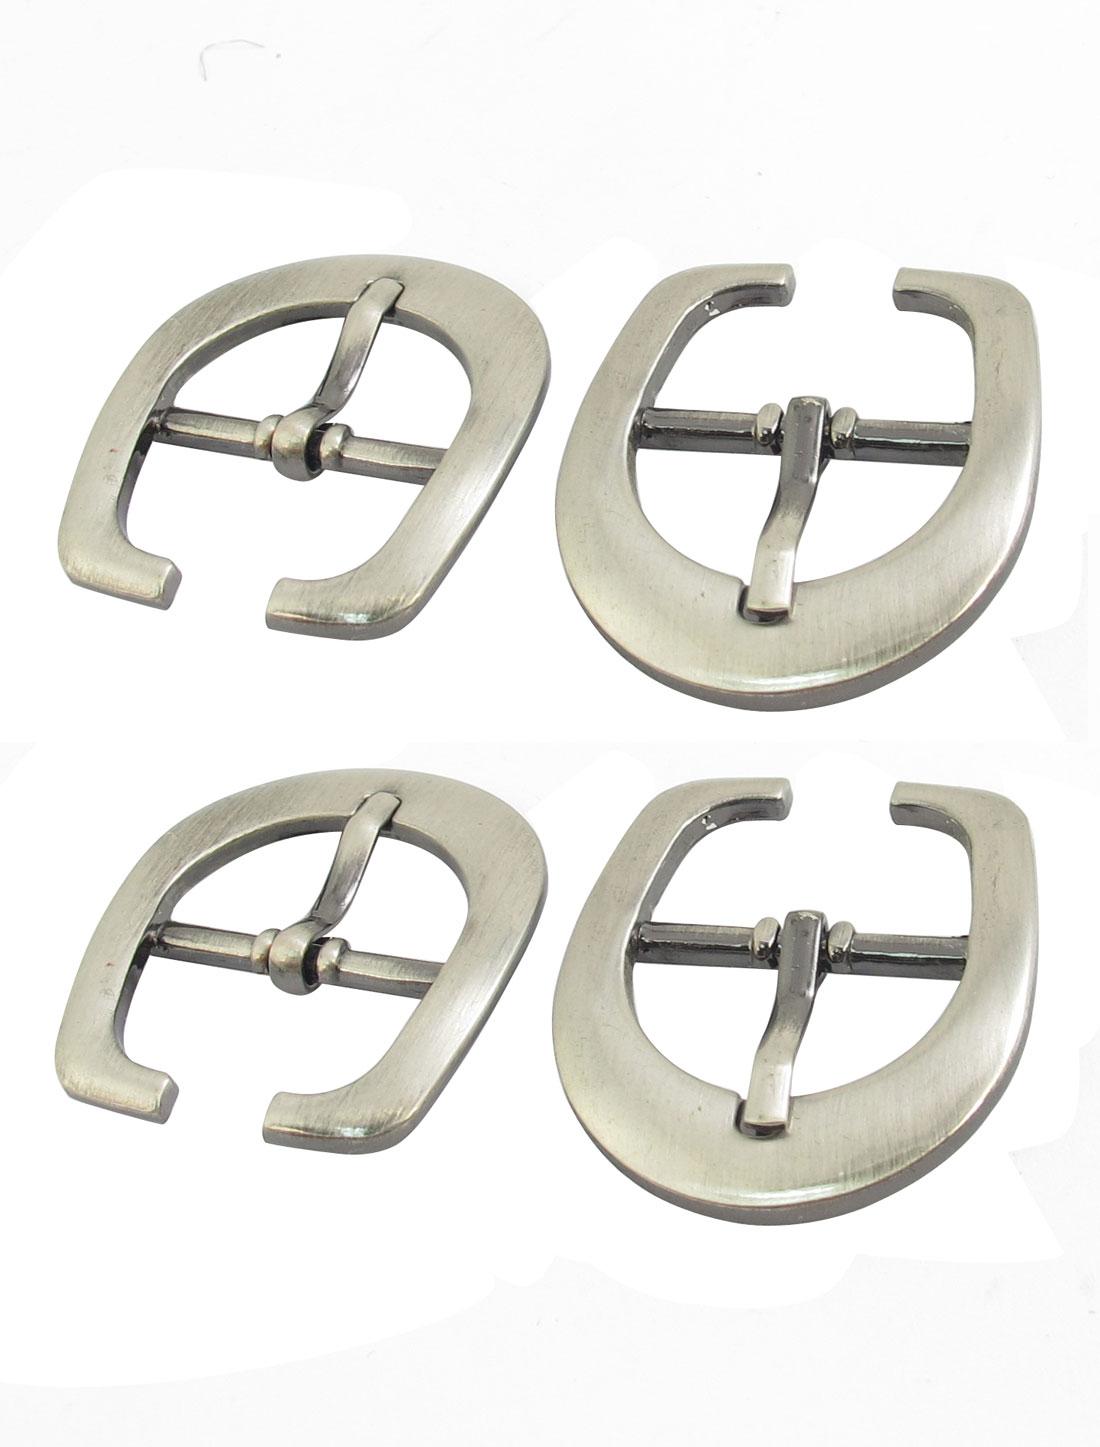 4 Pcs Silver Tone Metal Single Pin Stainless Steel Belt Buckle